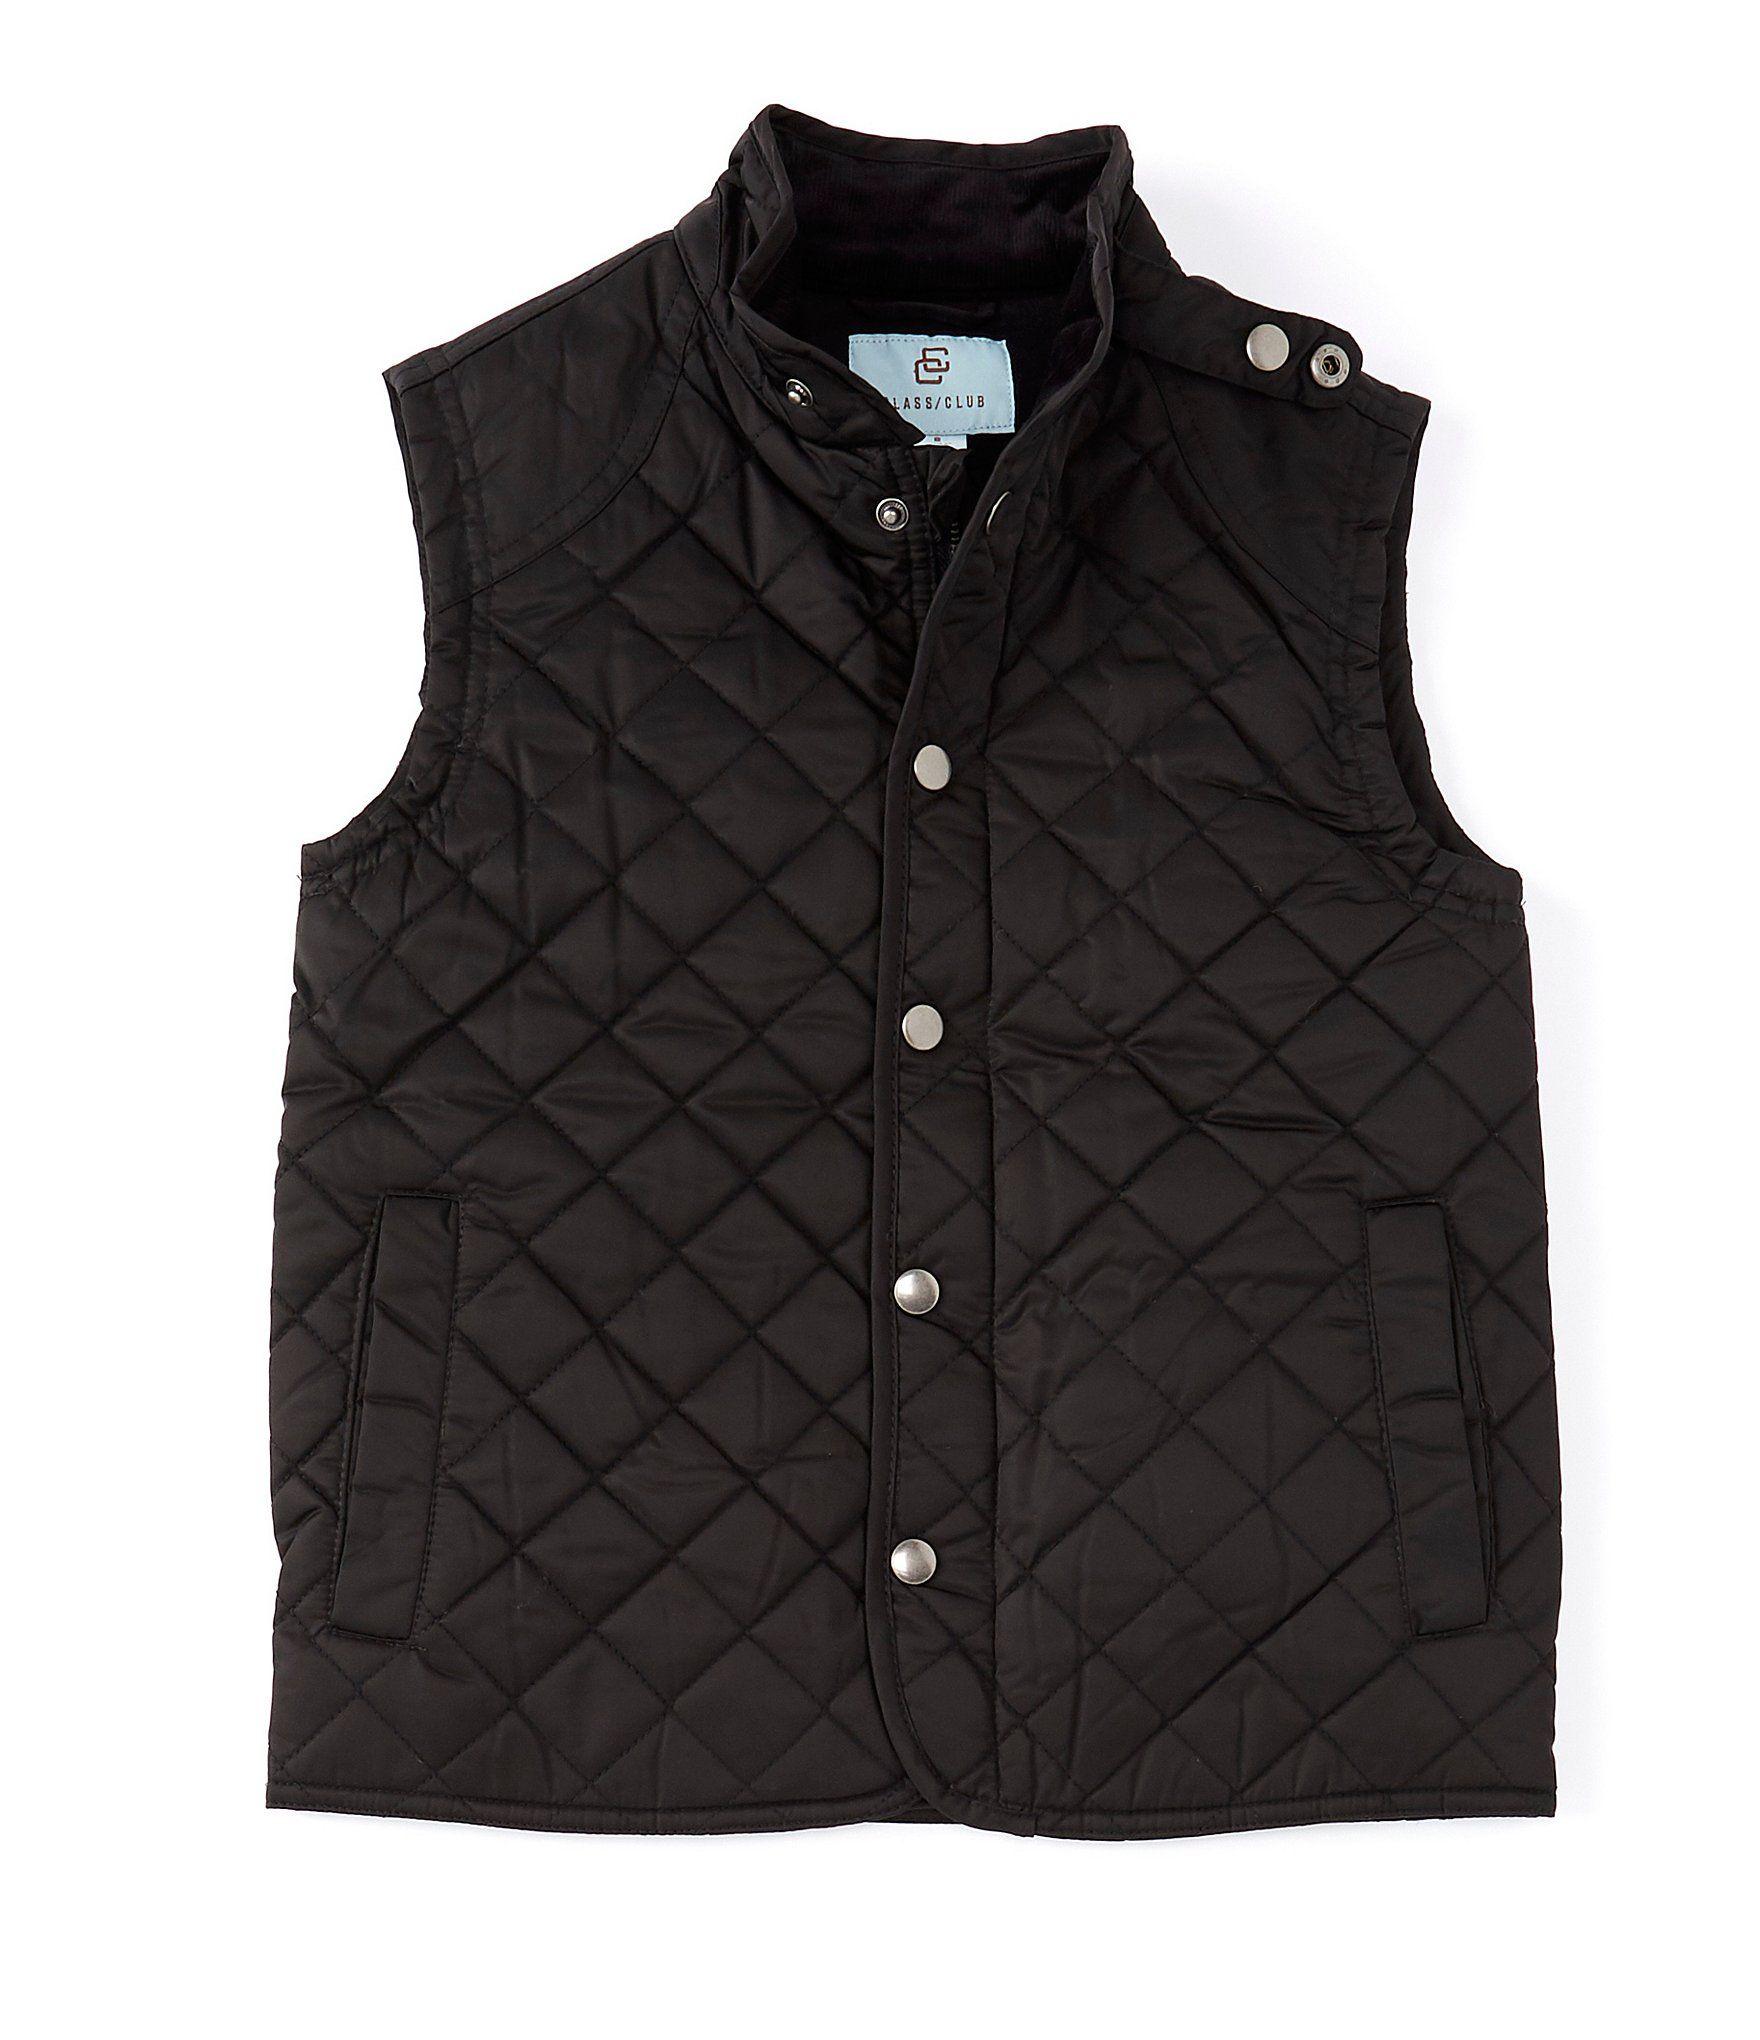 Class Club Big Boys 8-20 Fleece-Lined Quilted Vest | Dillard's